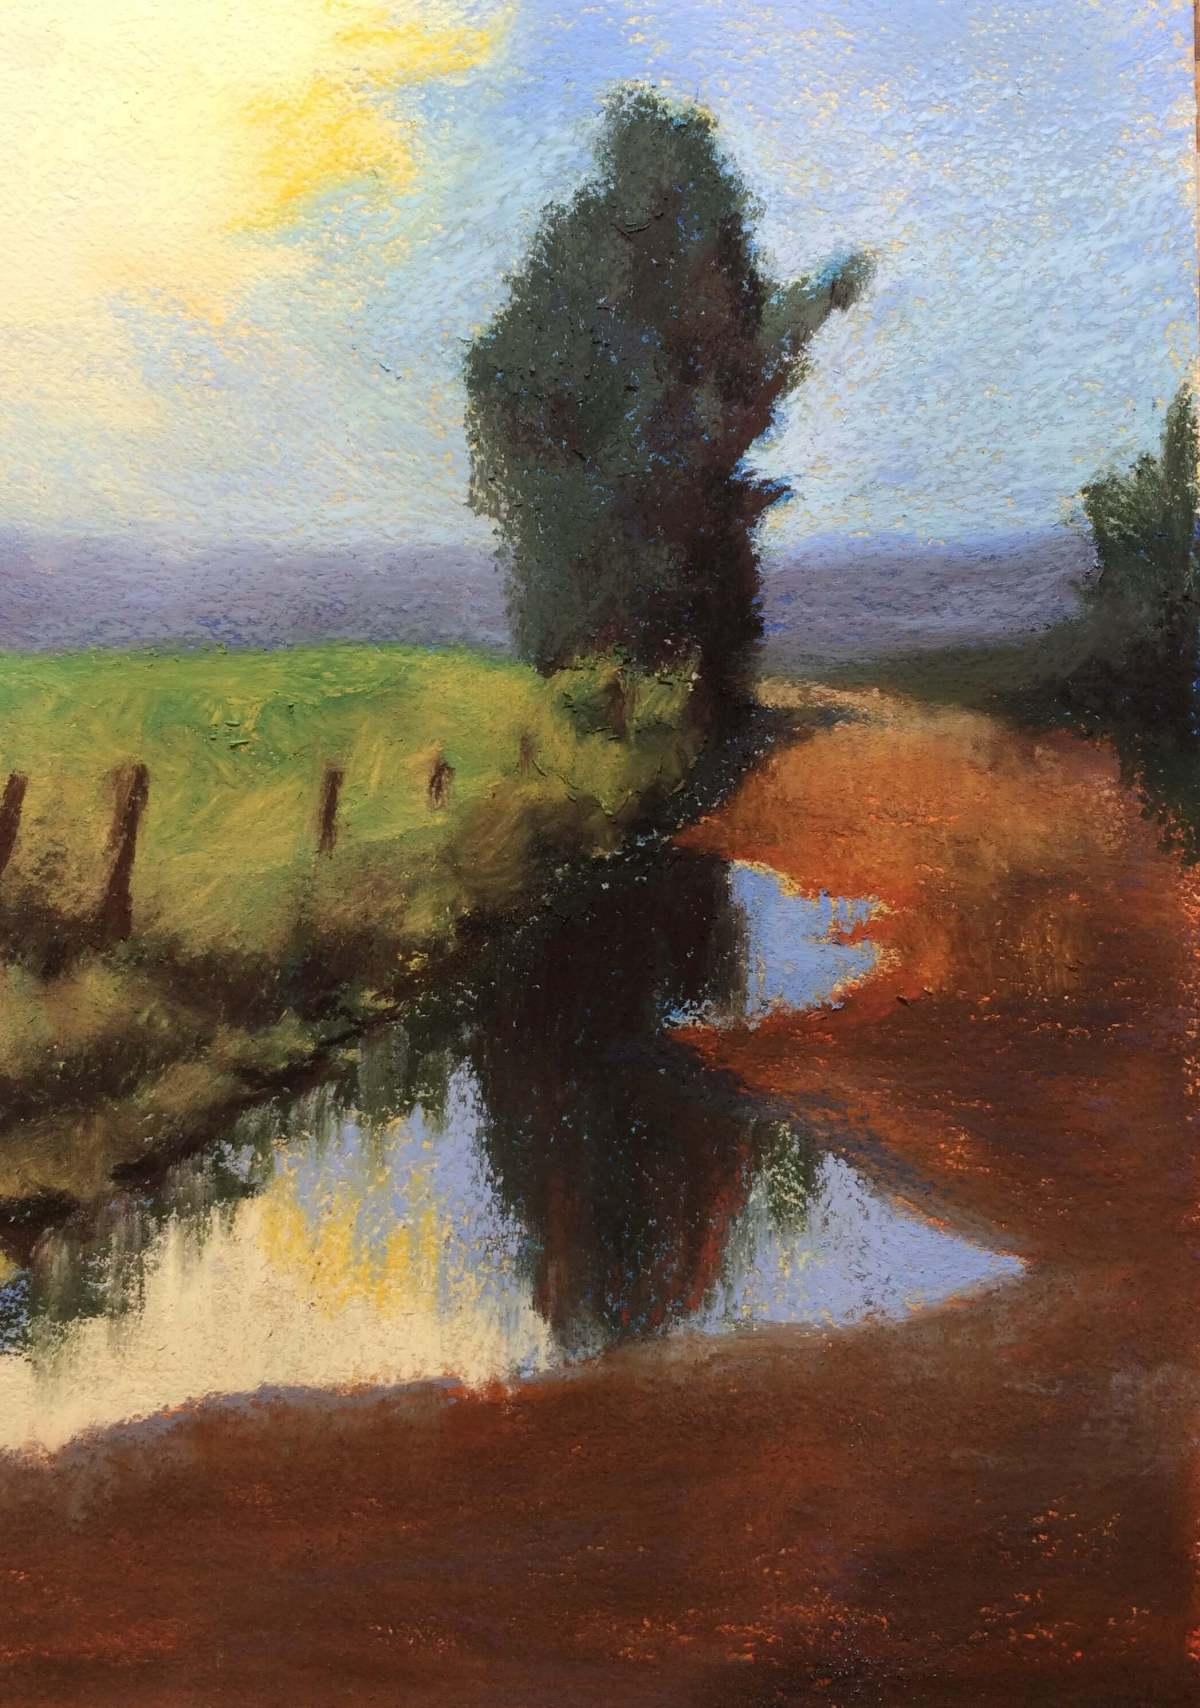 #P10: Summer Rain (Pastel on Paper, A4)